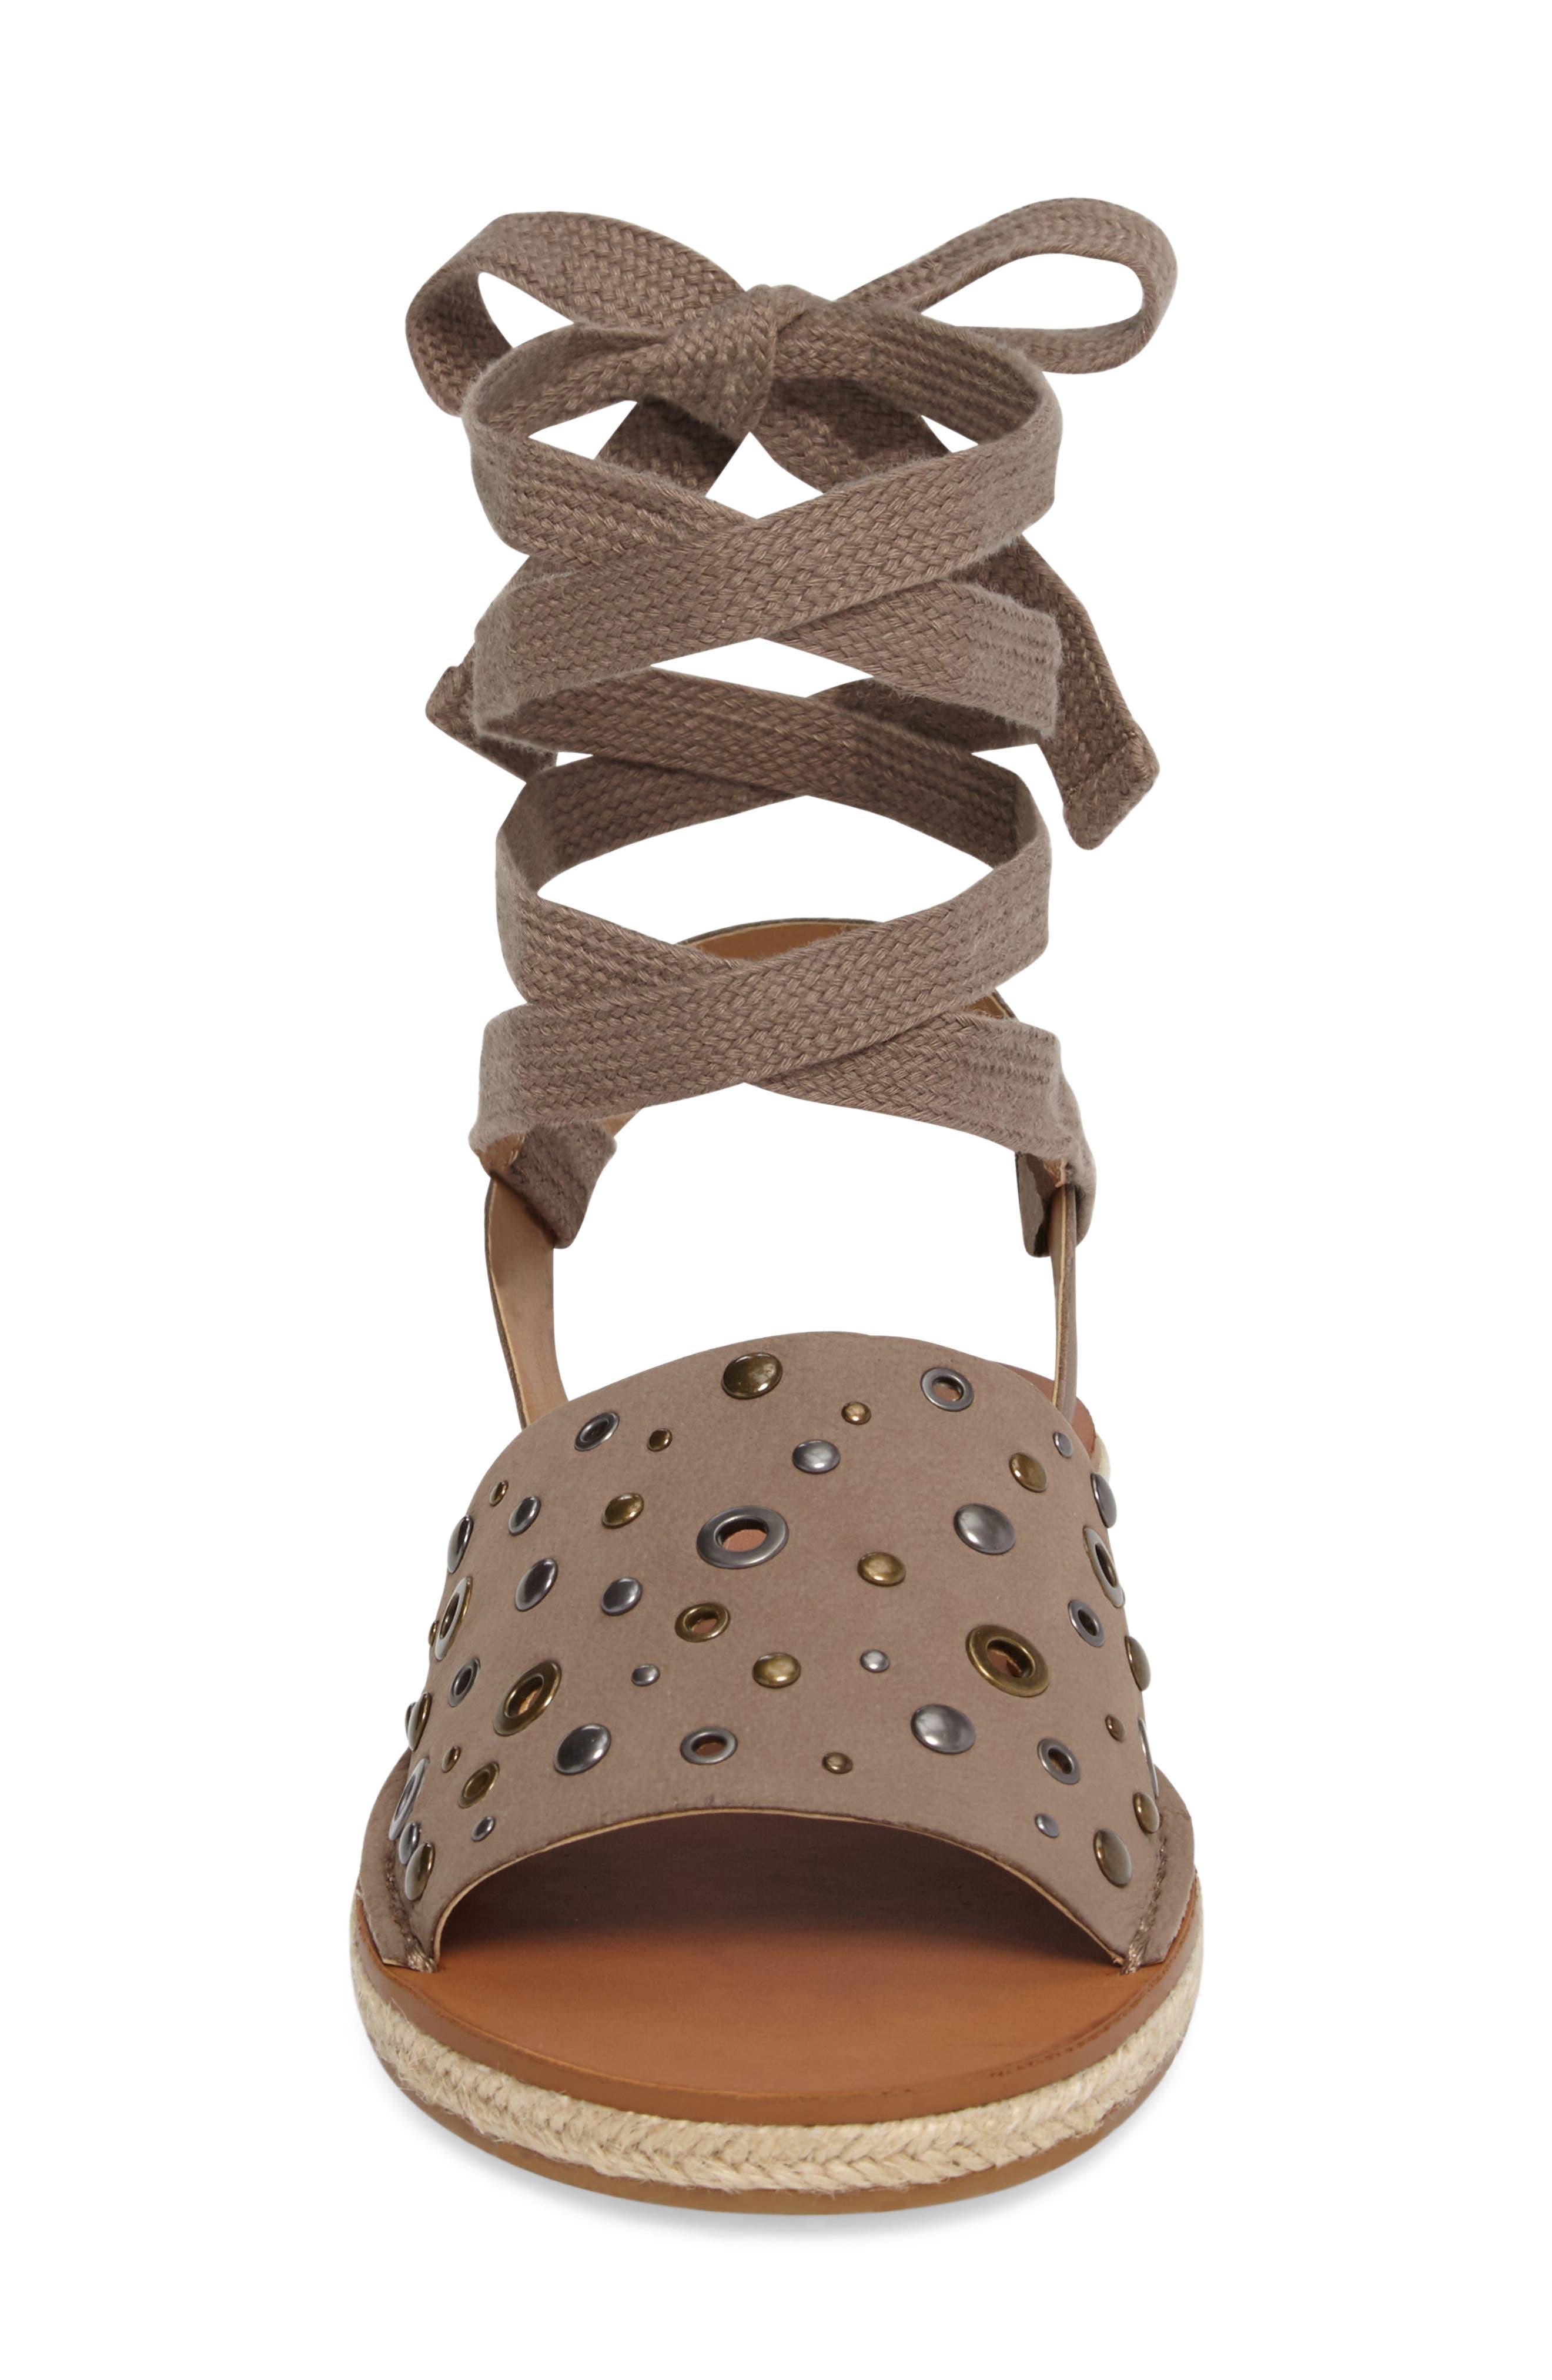 Daytah Ankle Tie Sandal,                             Alternate thumbnail 14, color,